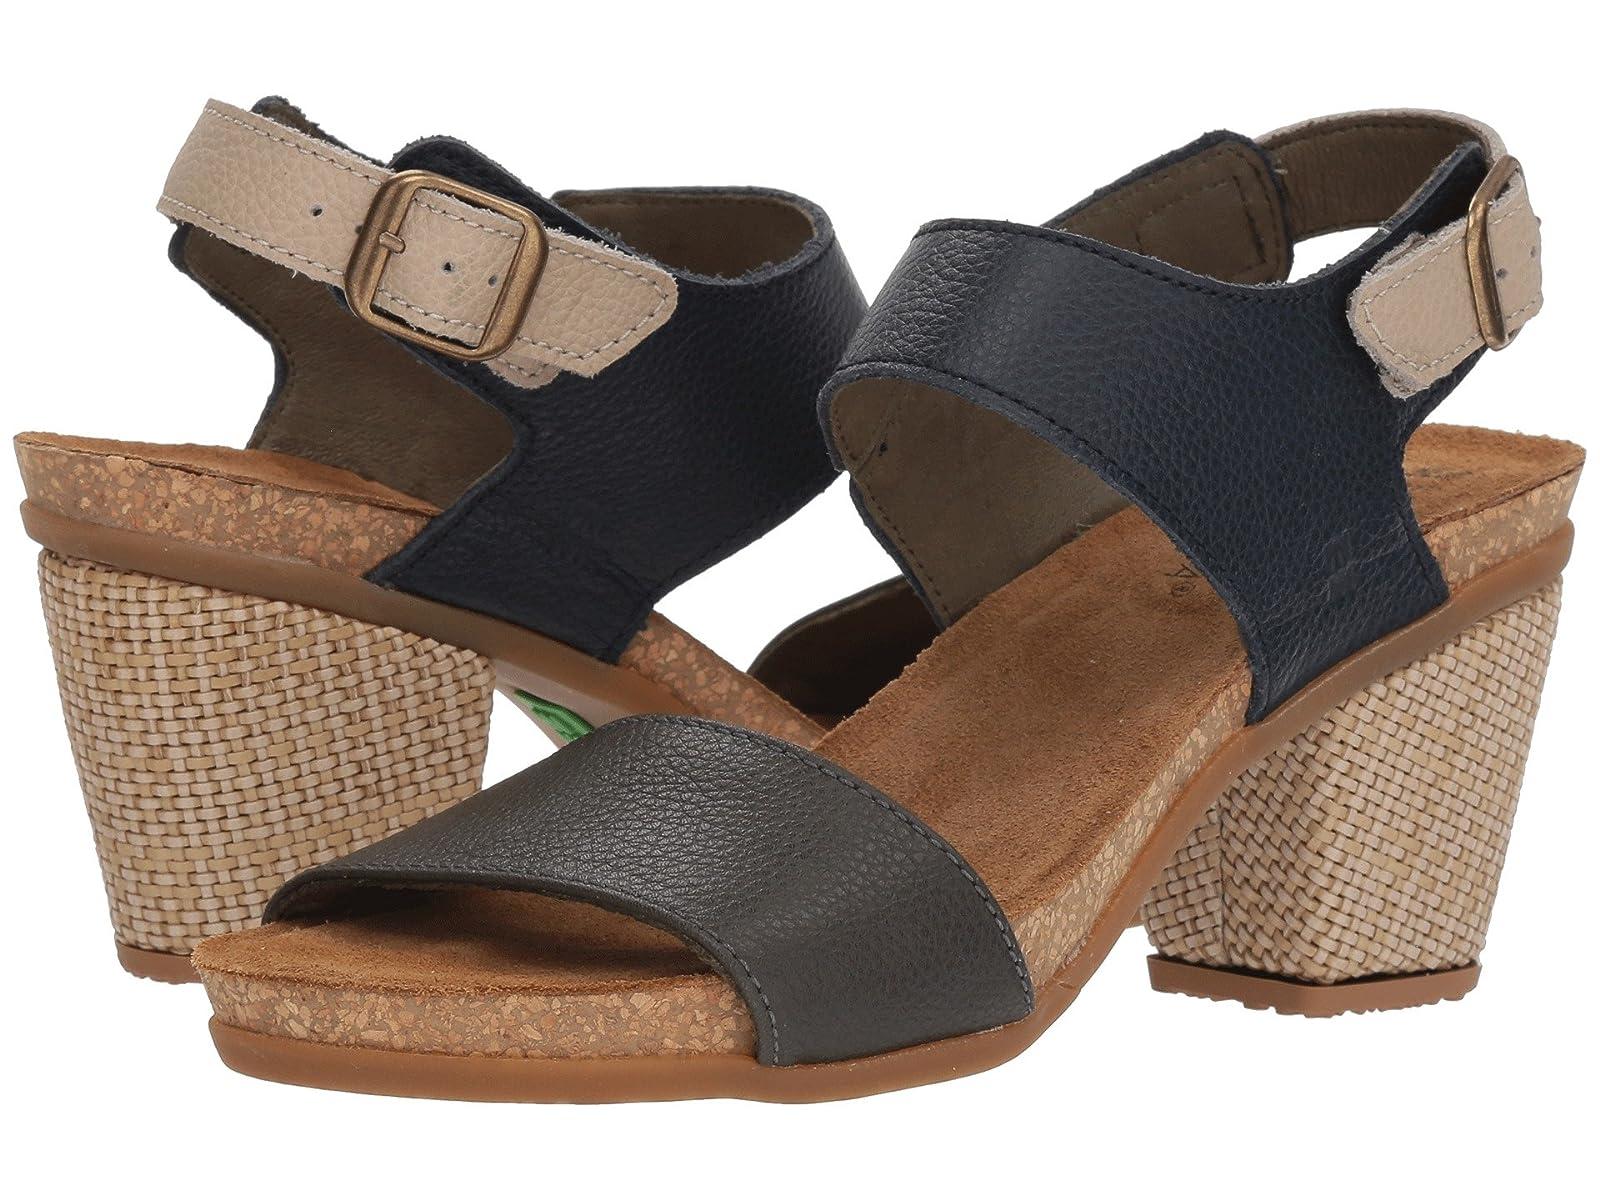 El Naturalista Mola N5033Atmospheric grades have affordable shoes